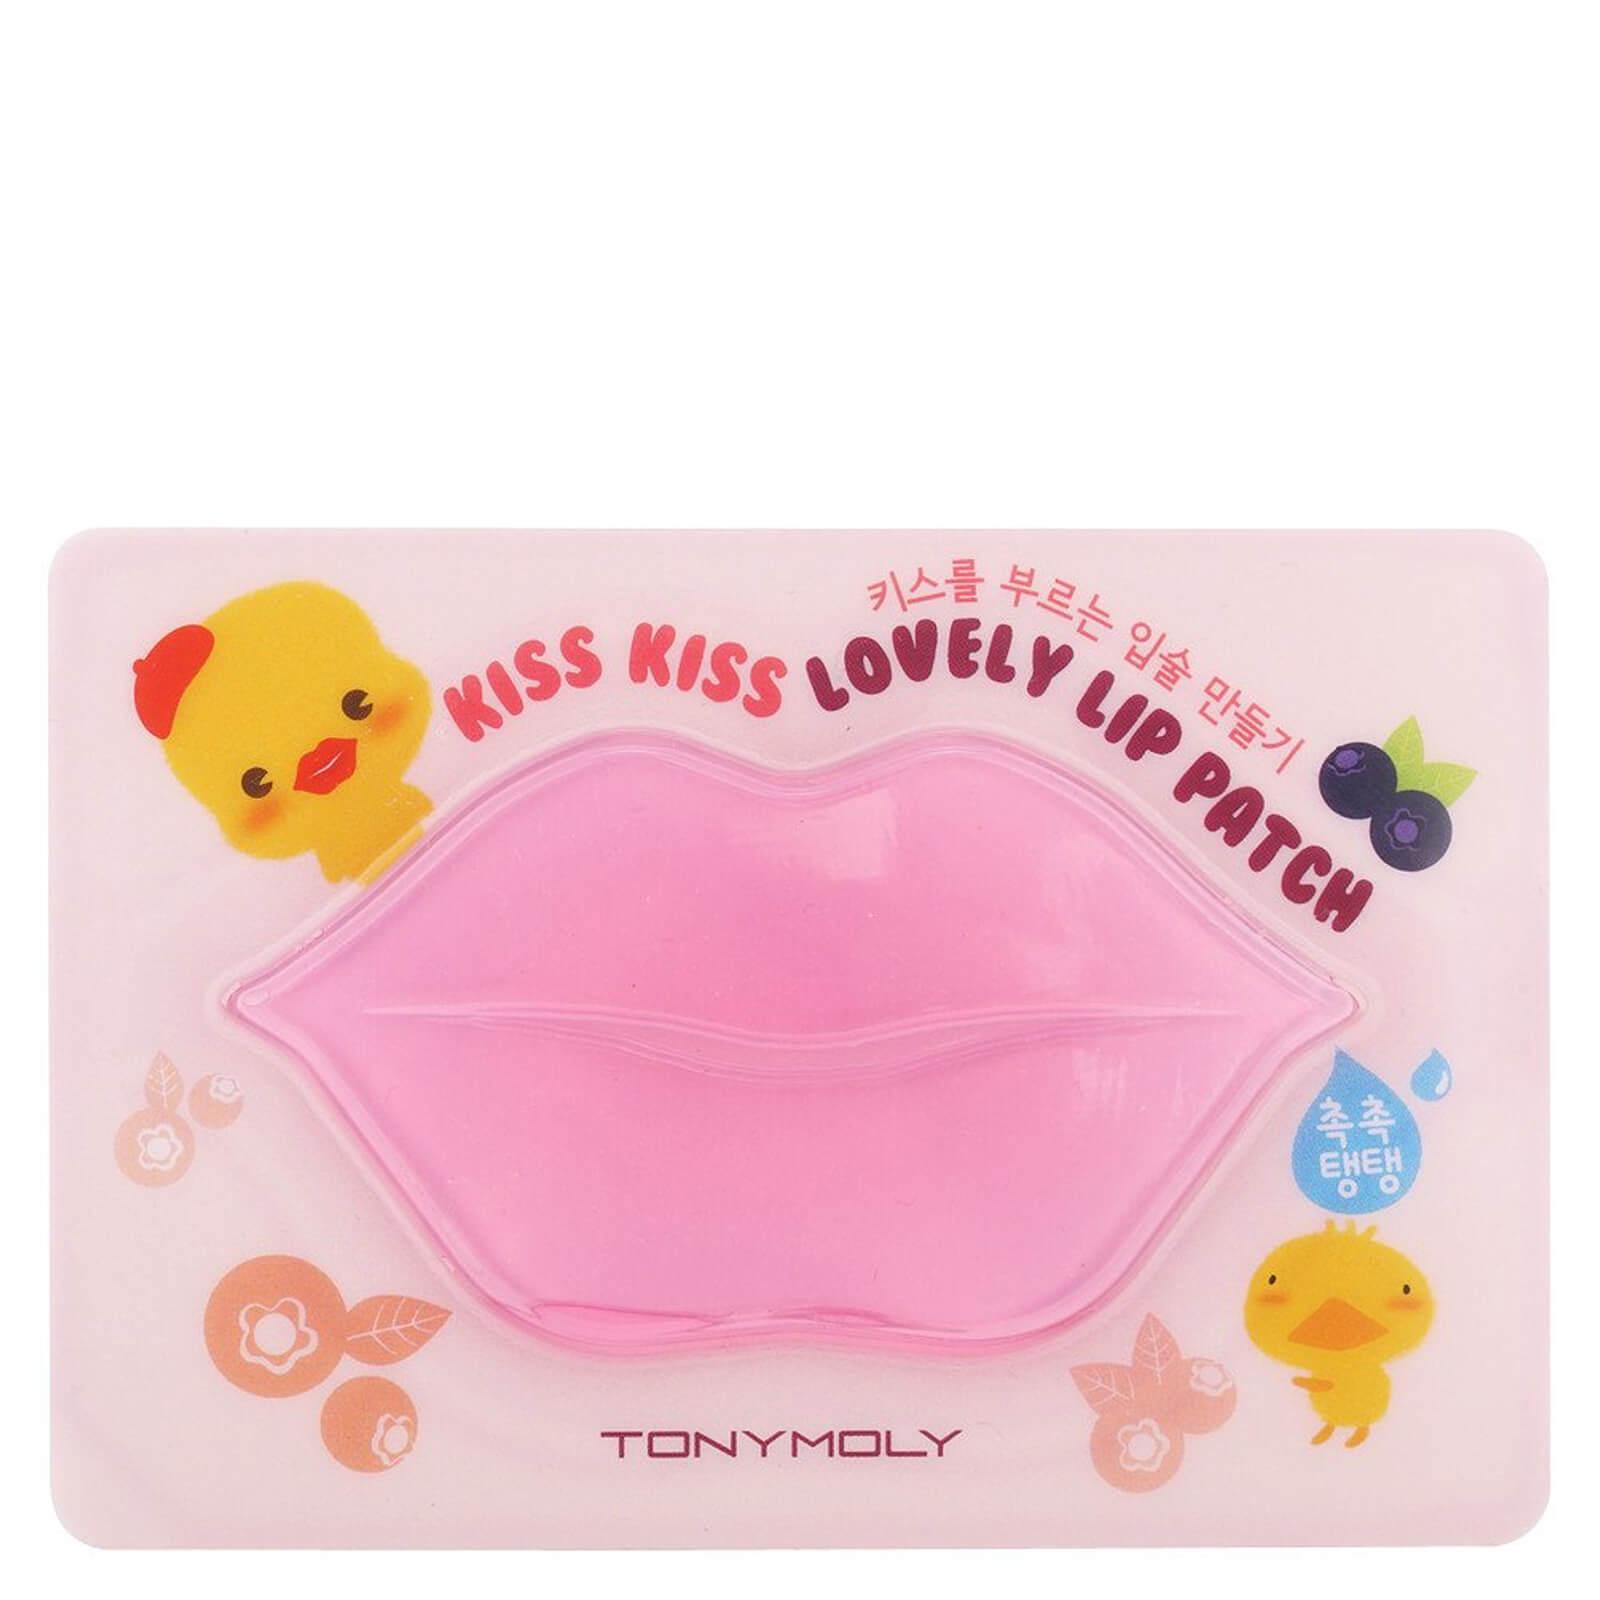 Купить TONYMOLY Kiss Kiss Lovely Lip Patch In Berry 10g